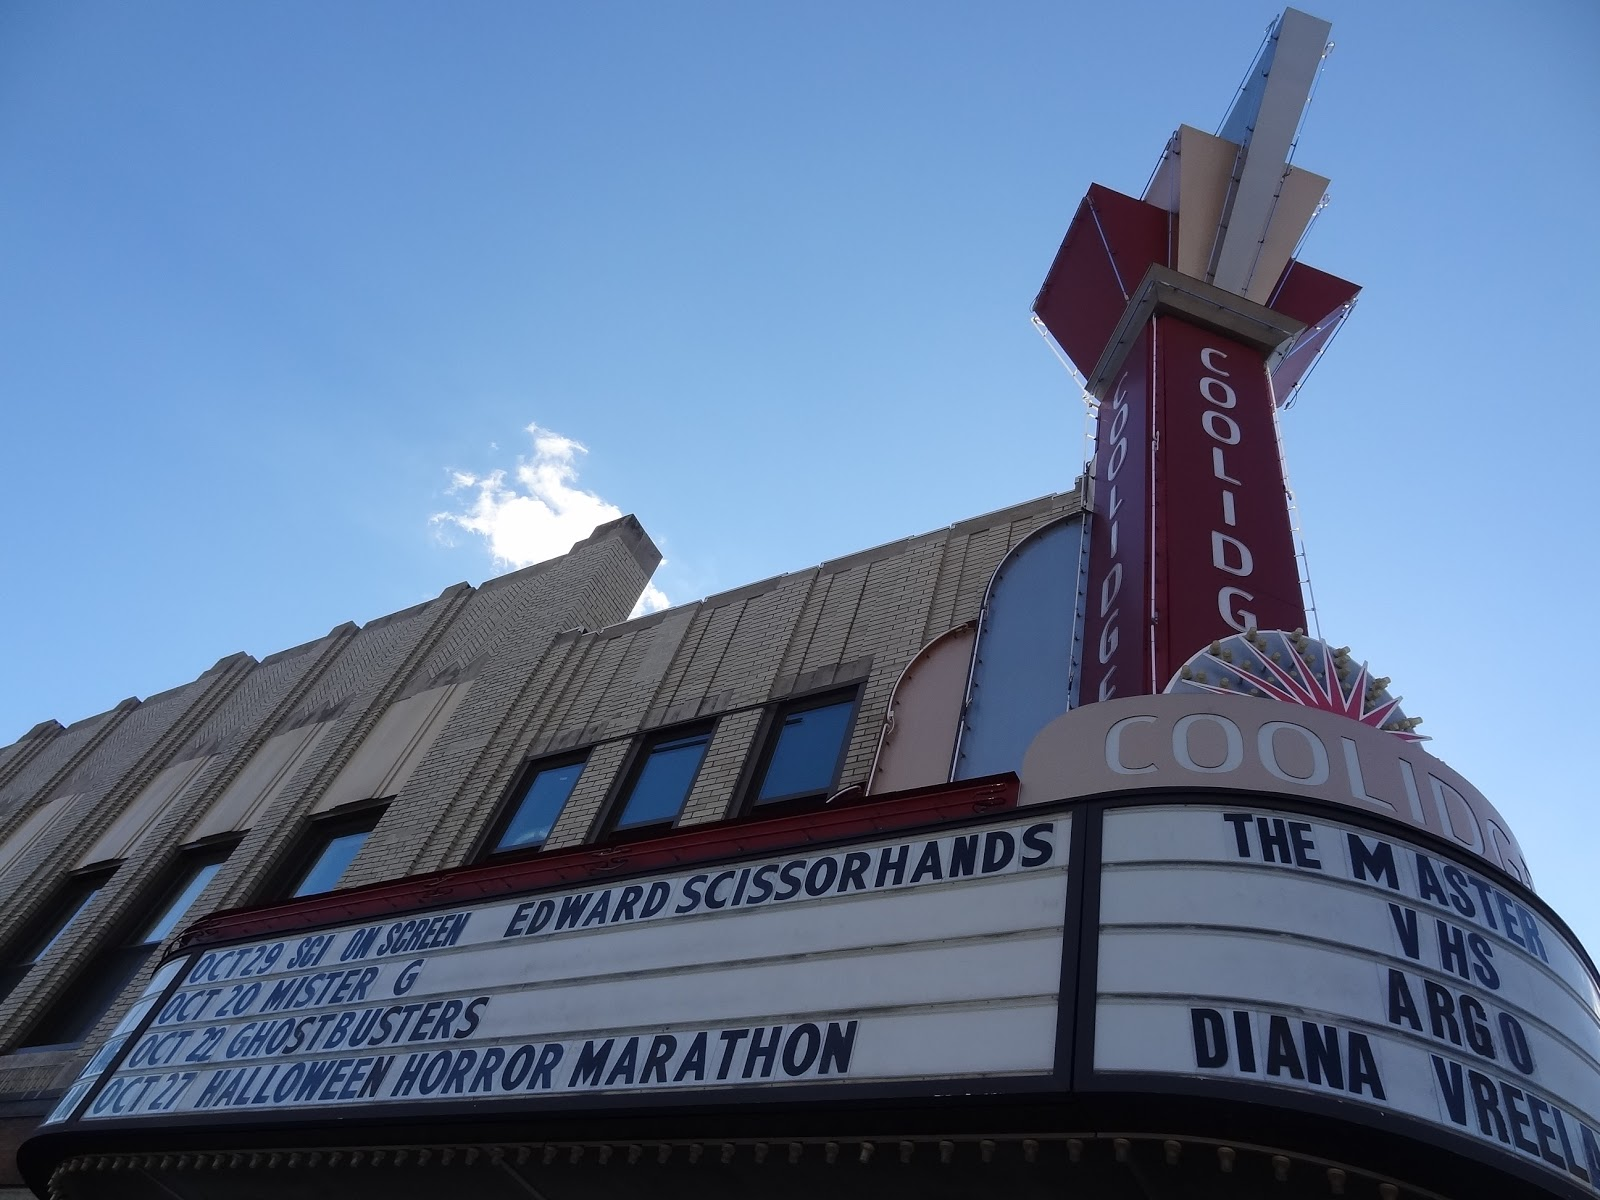 Coolidge Corner Theater Marquee Brookline-1.JPG